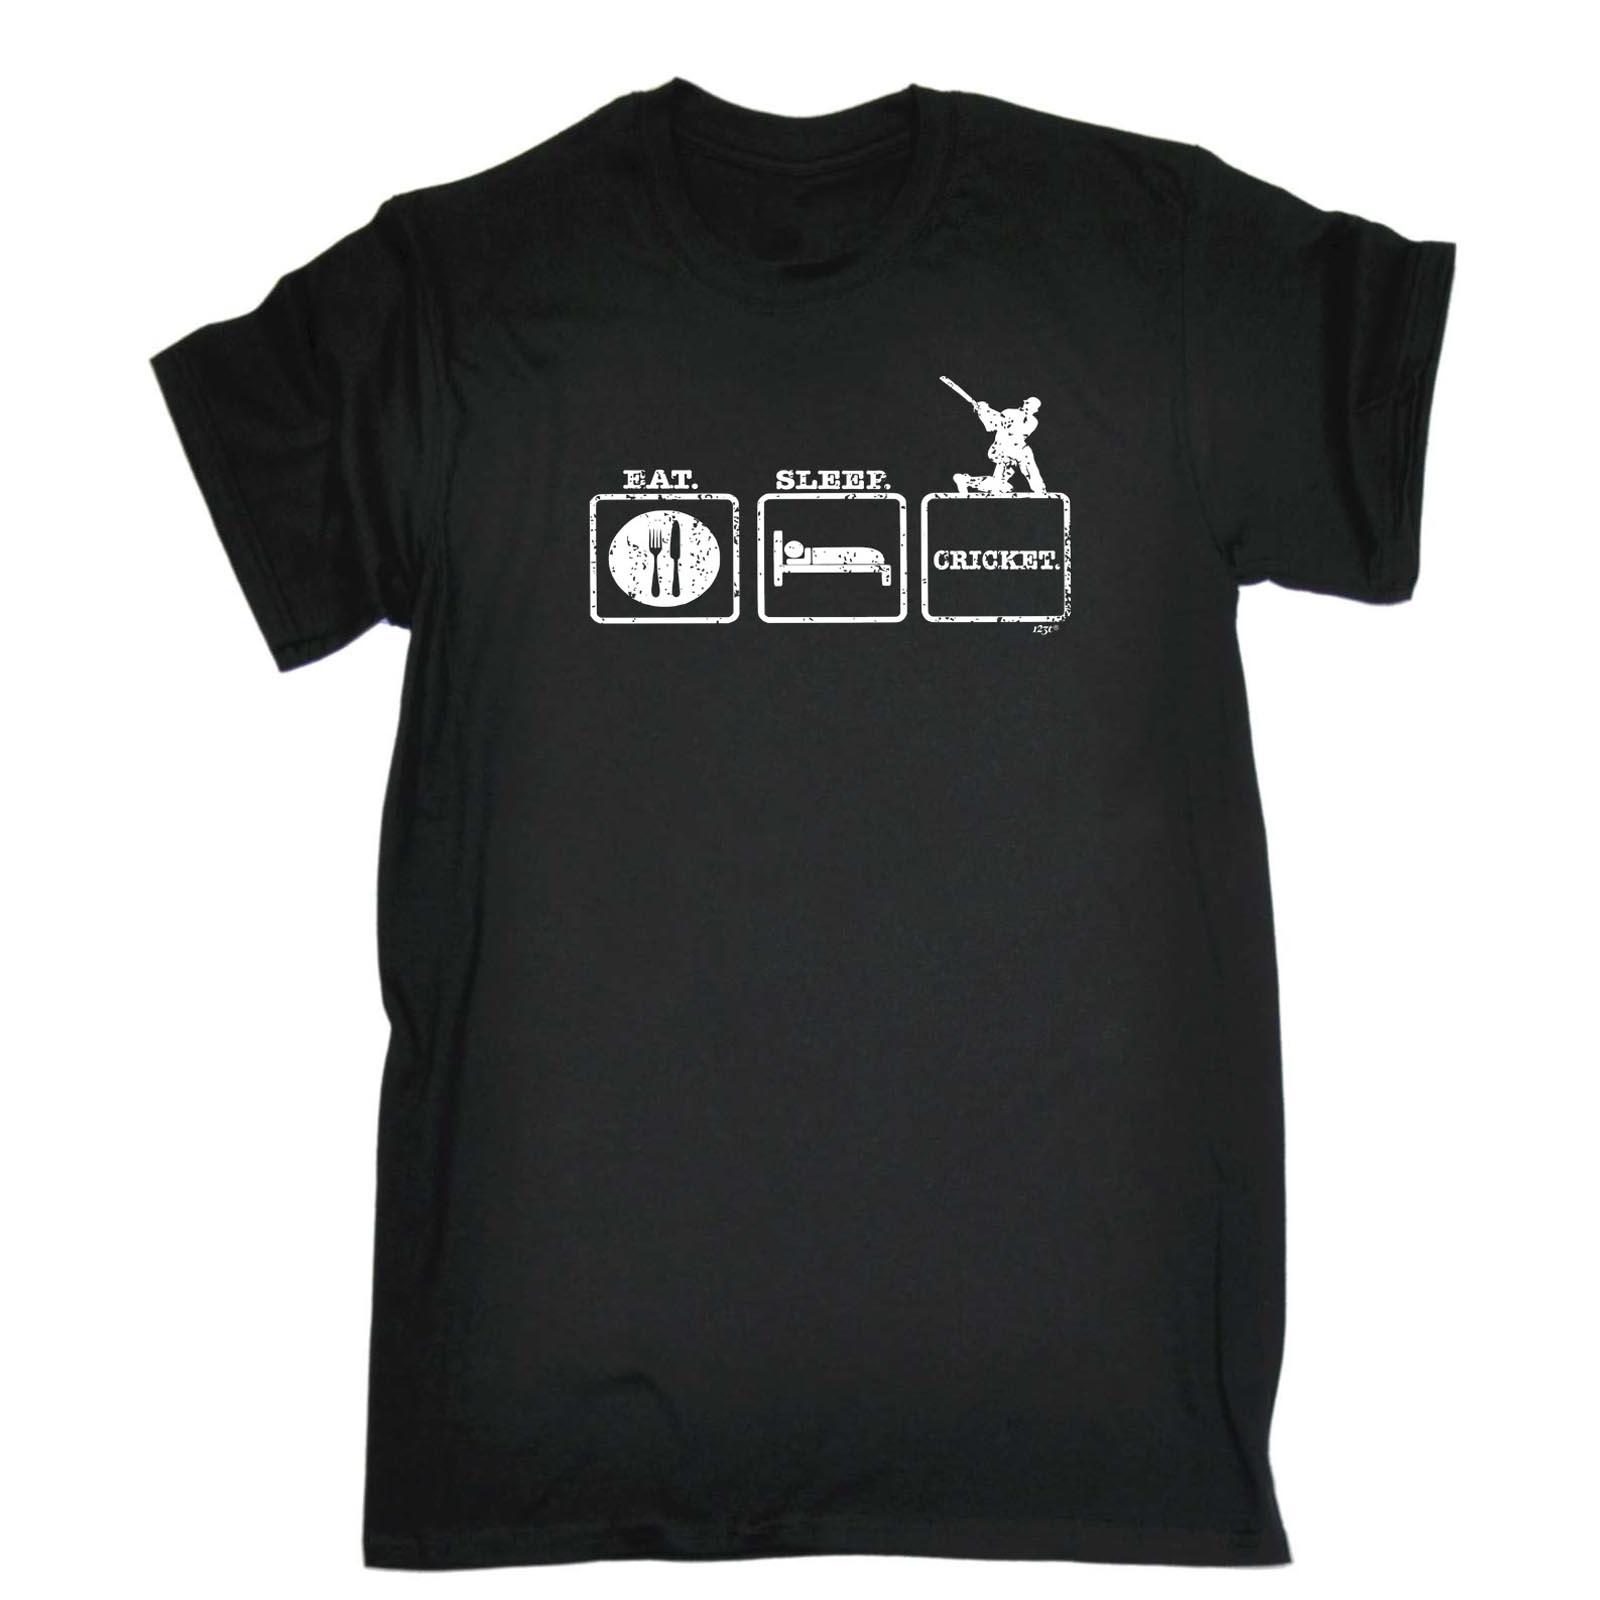 Sports-Funny-Novelty-T-Shirt-Mens-tee-TShirt-SUPER-MENS-AX1 thumbnail 18